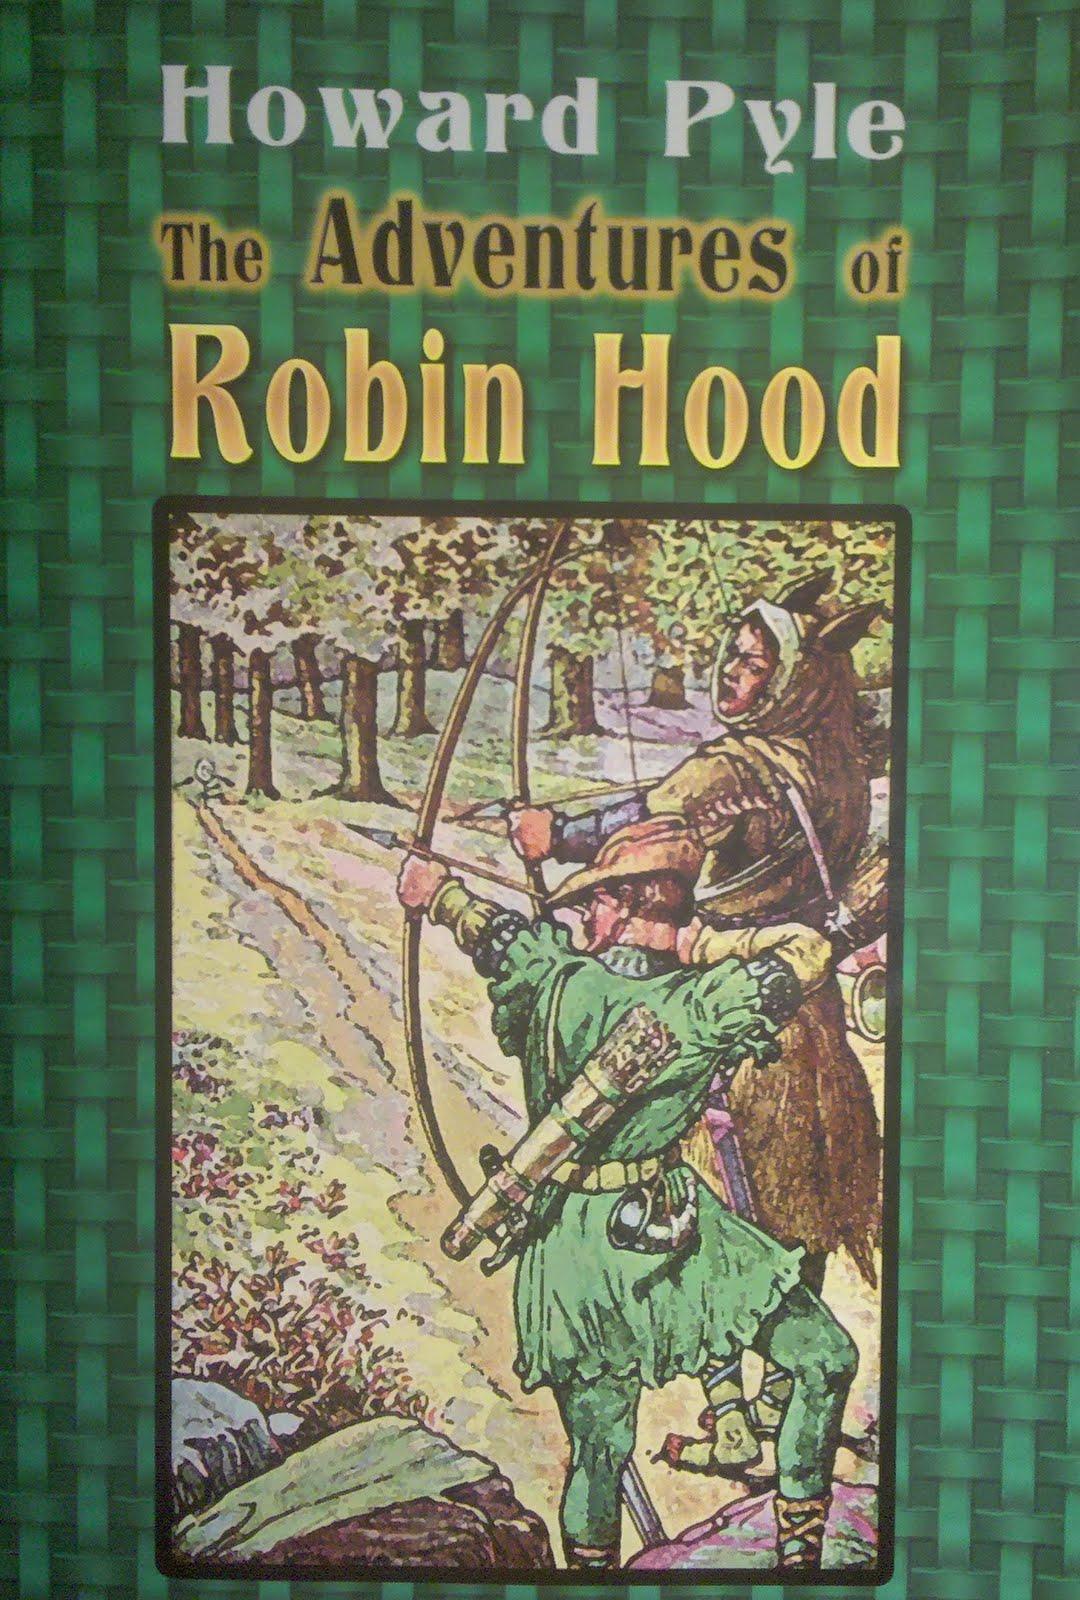 http://4.bp.blogspot.com/_jd0xwiHRpy4/S_vdsTEhHjI/AAAAAAAAAdQ/FQRHMBCzf2g/s1600/Merry+Adventures+of+Robin+Hood.jpg